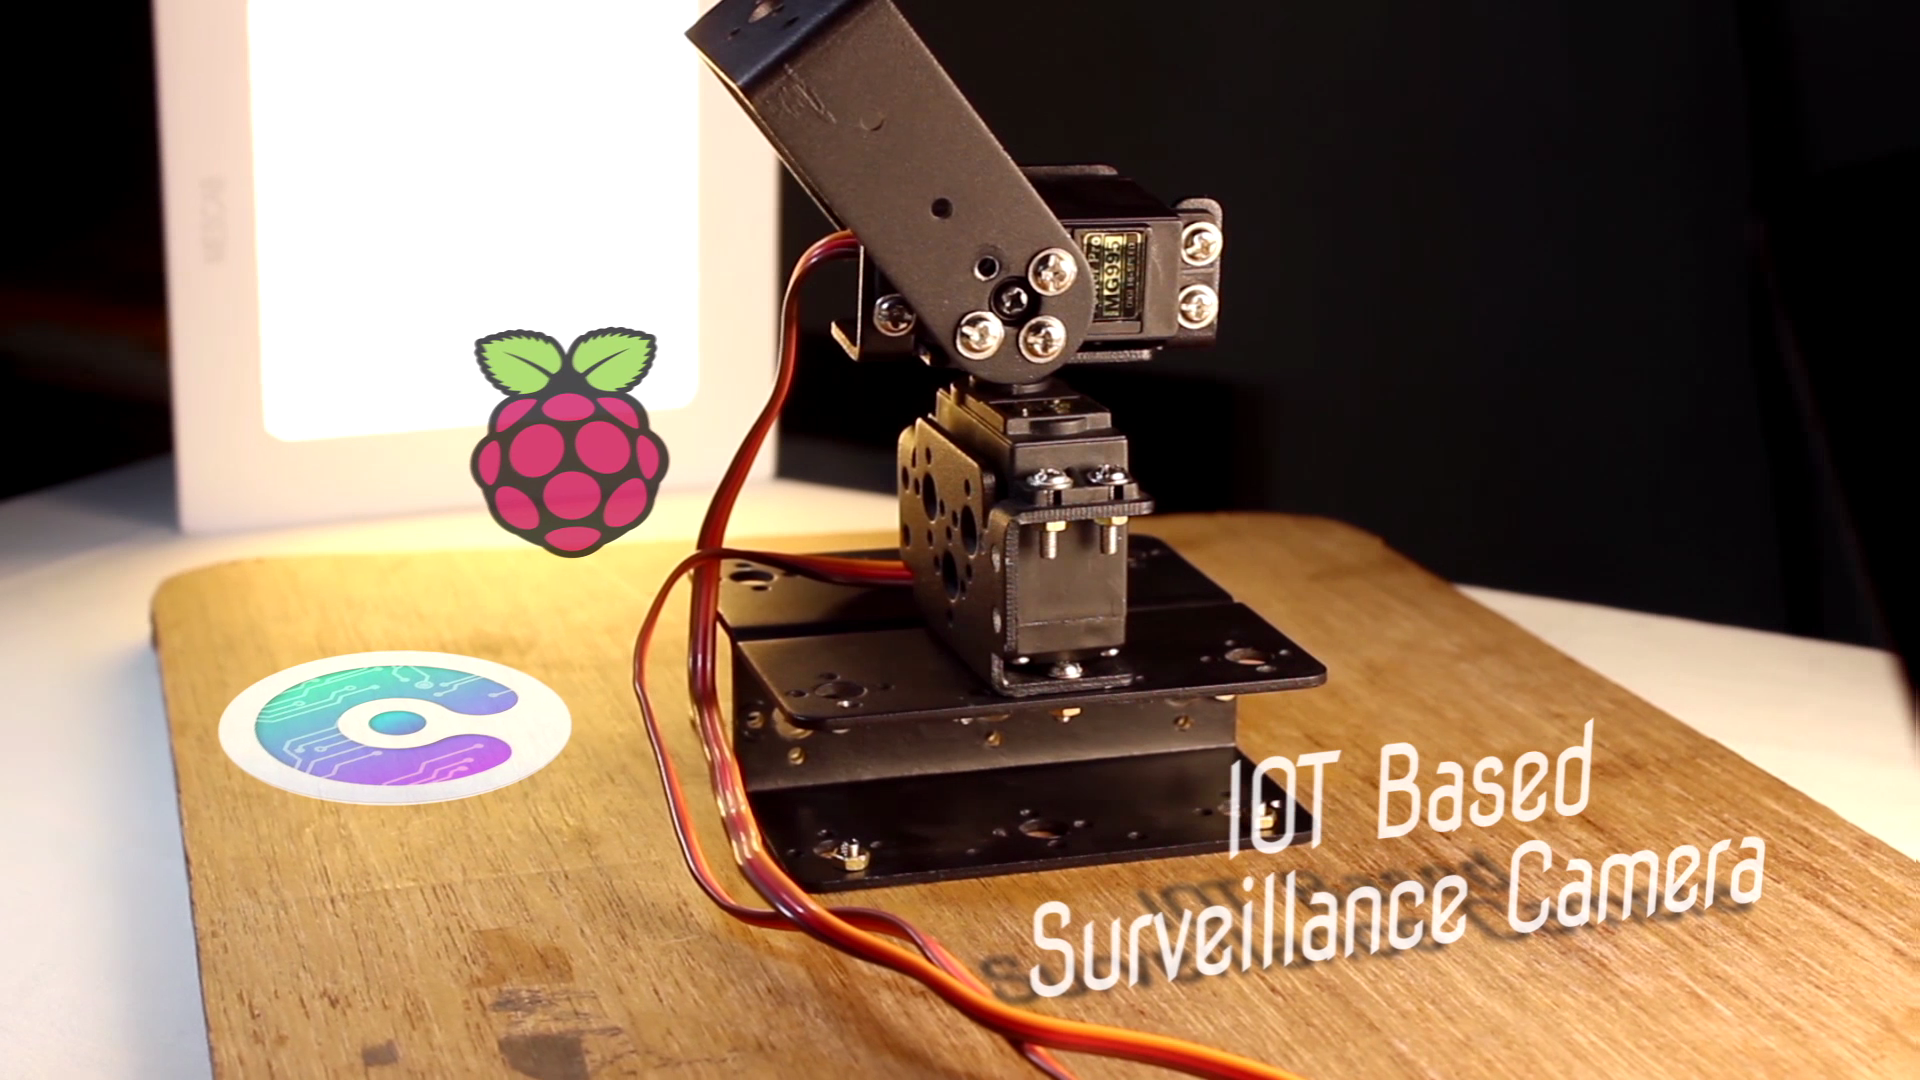 Picture of IOT Based Surveillance Camera || Raspberry Pi + Pan-Tilt Arrangement + Cayenne + Webcam Server